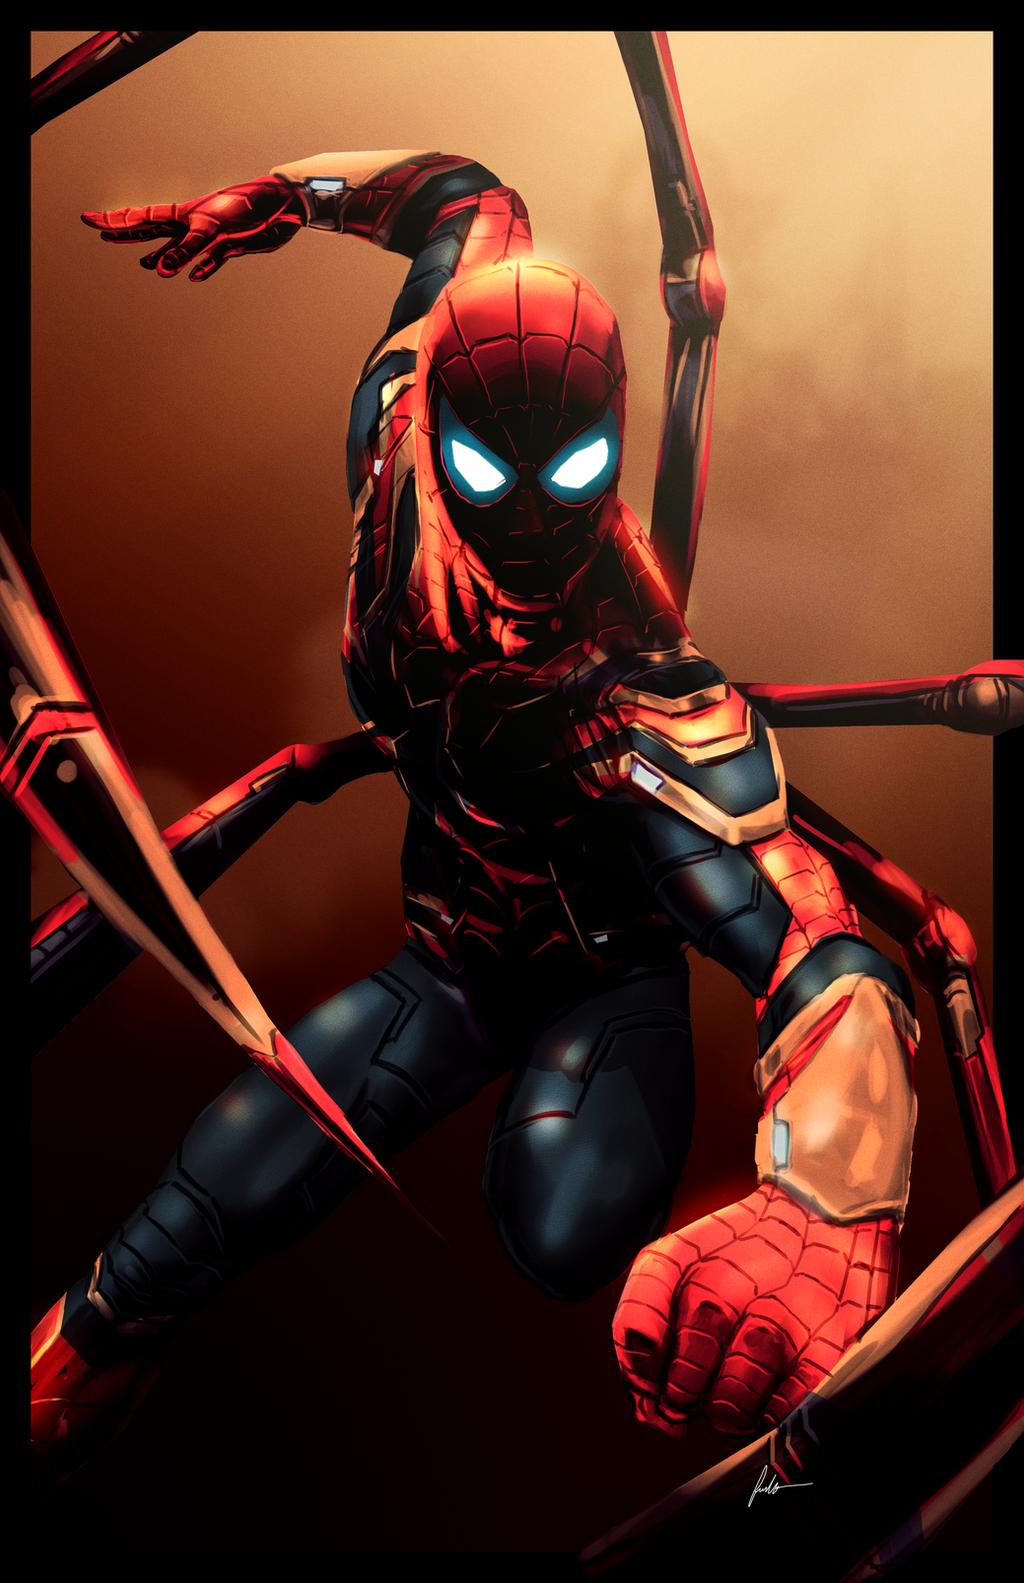 Arachnid by IronWarrior777